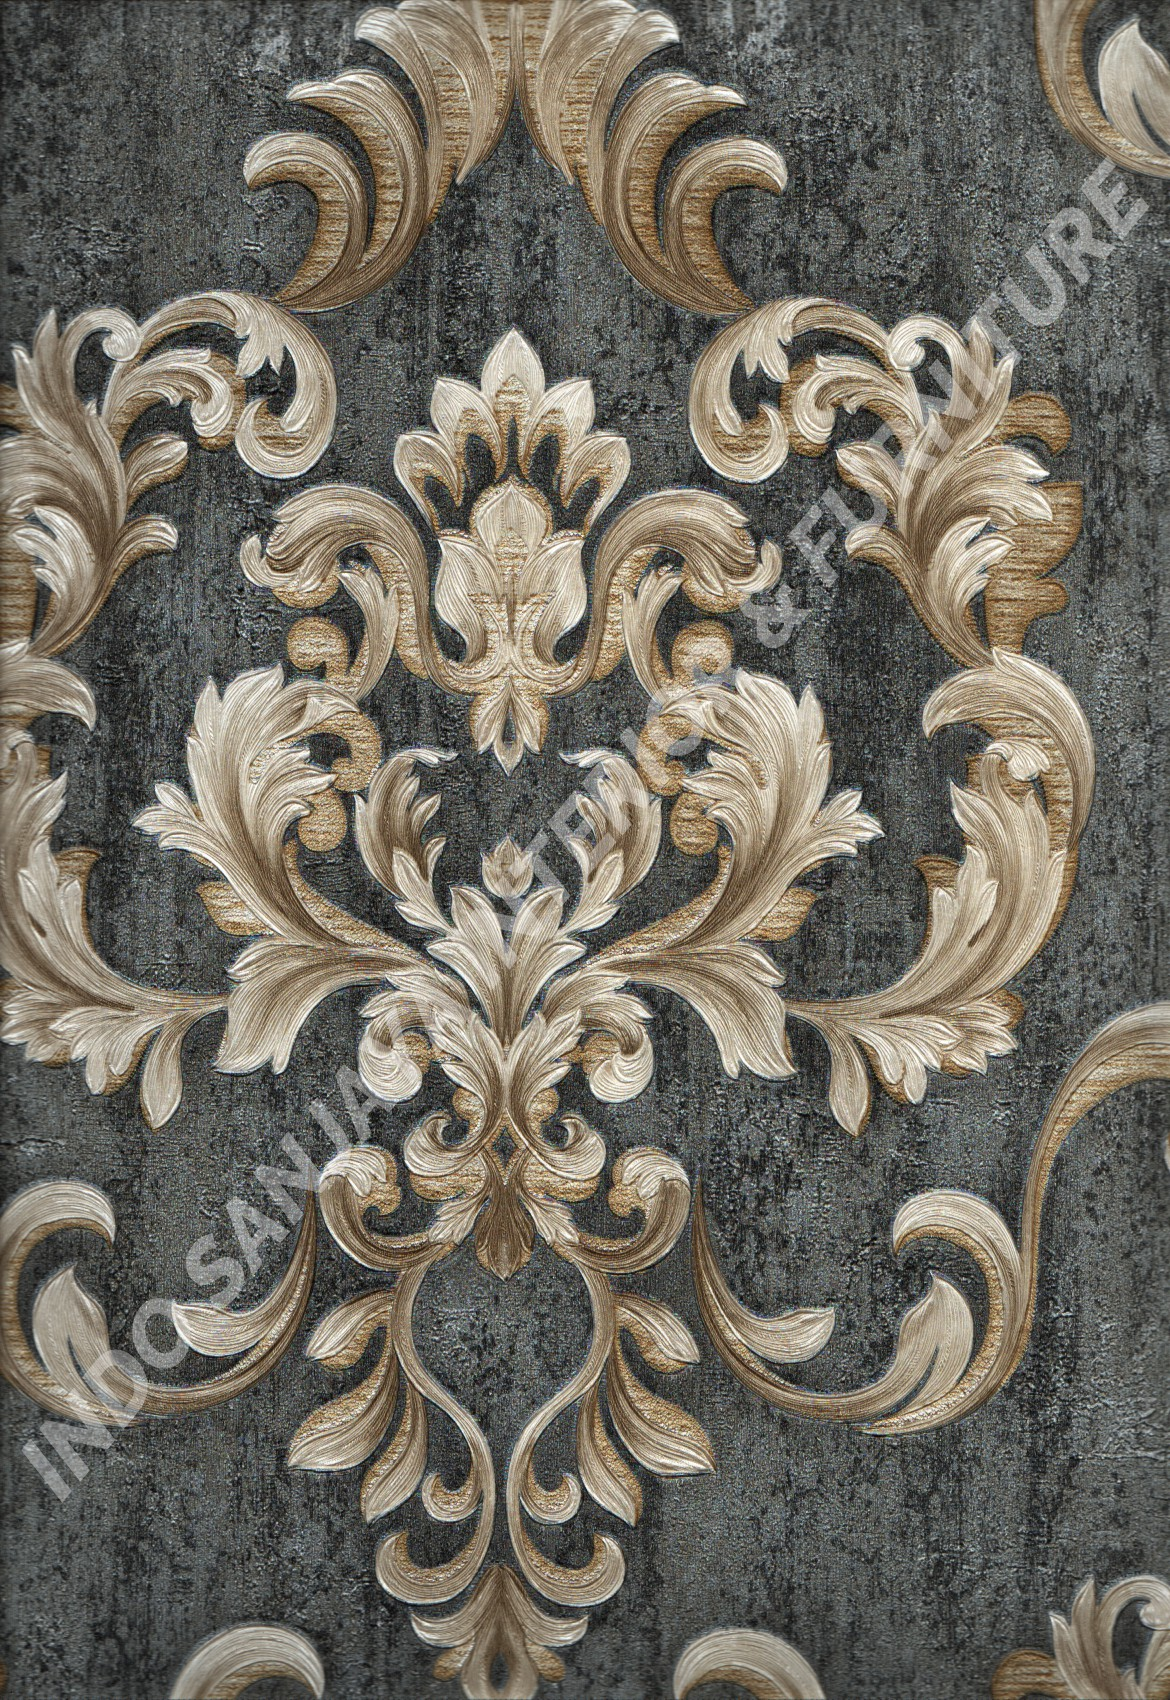 wallpaper   Wallpaper Klasik Batik (Damask) YG80505:YG80505 corak  warna